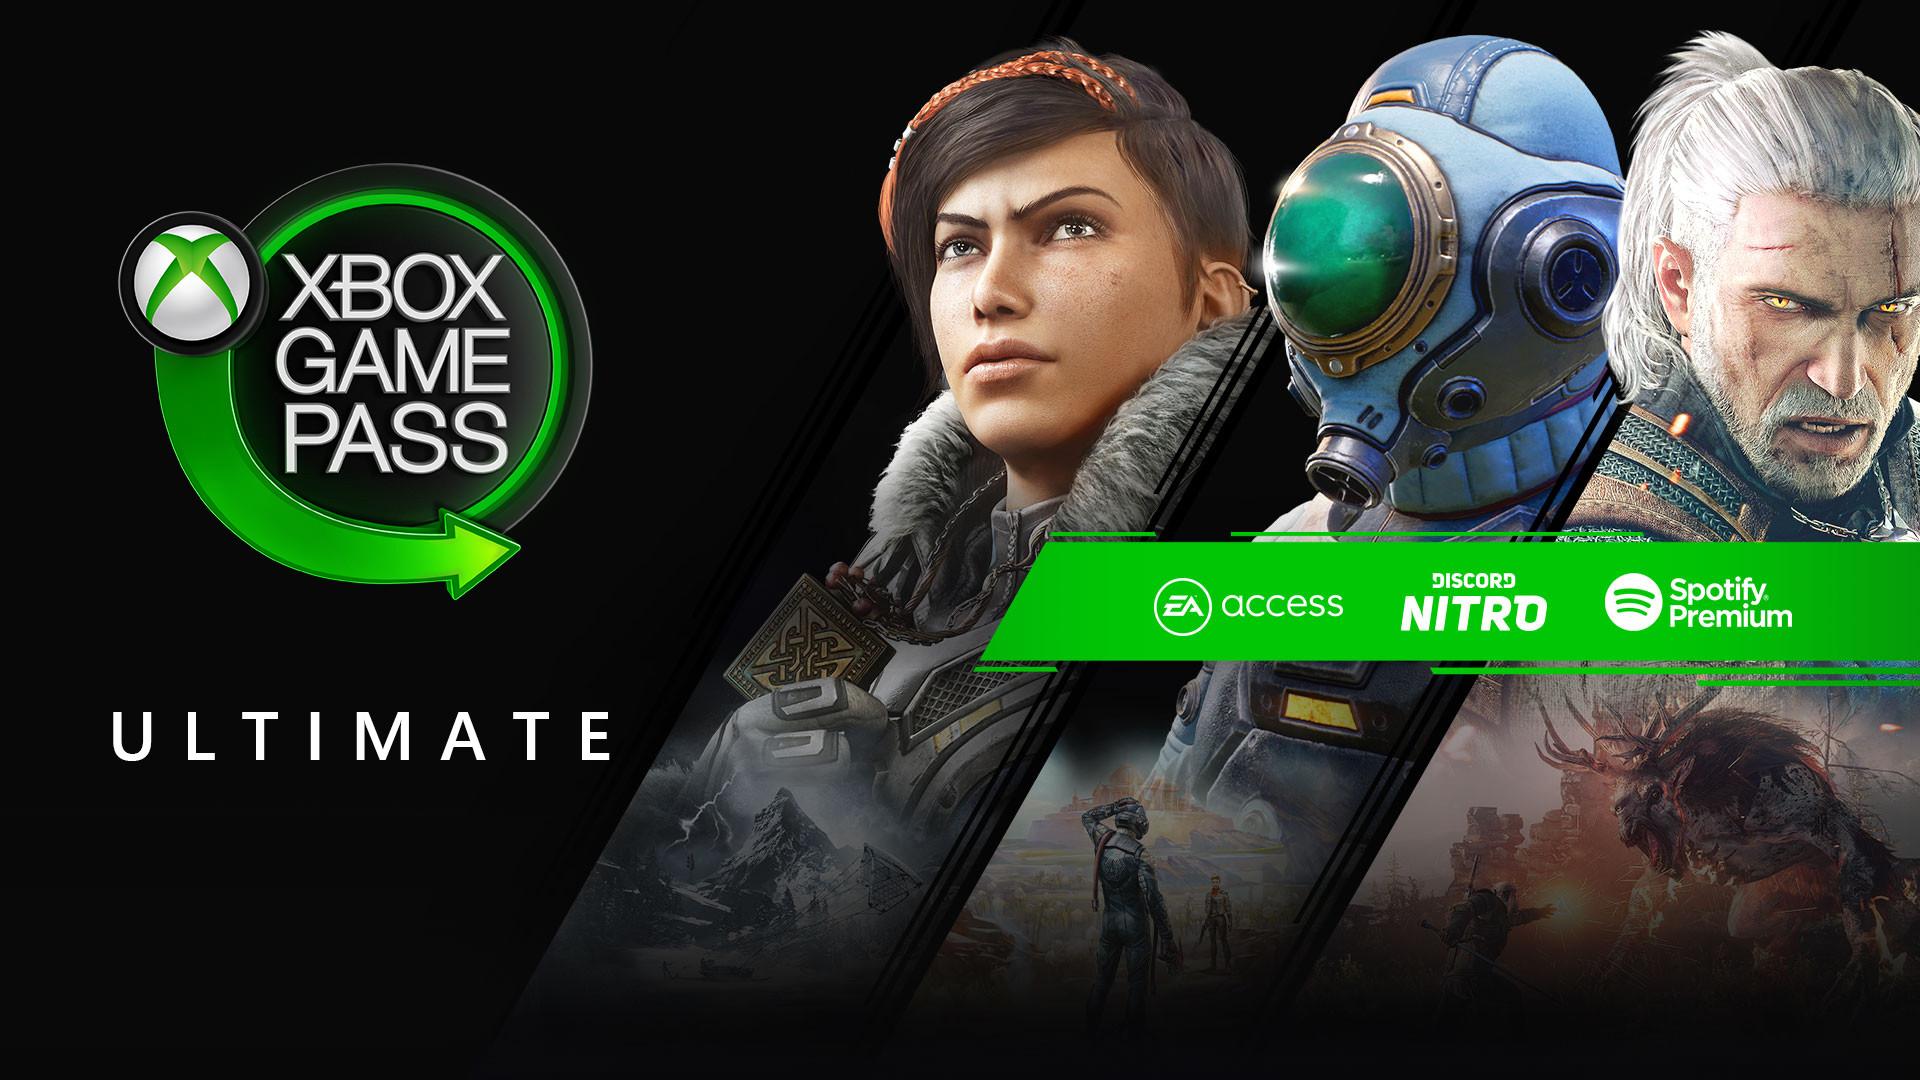 Gamepass Ultimate